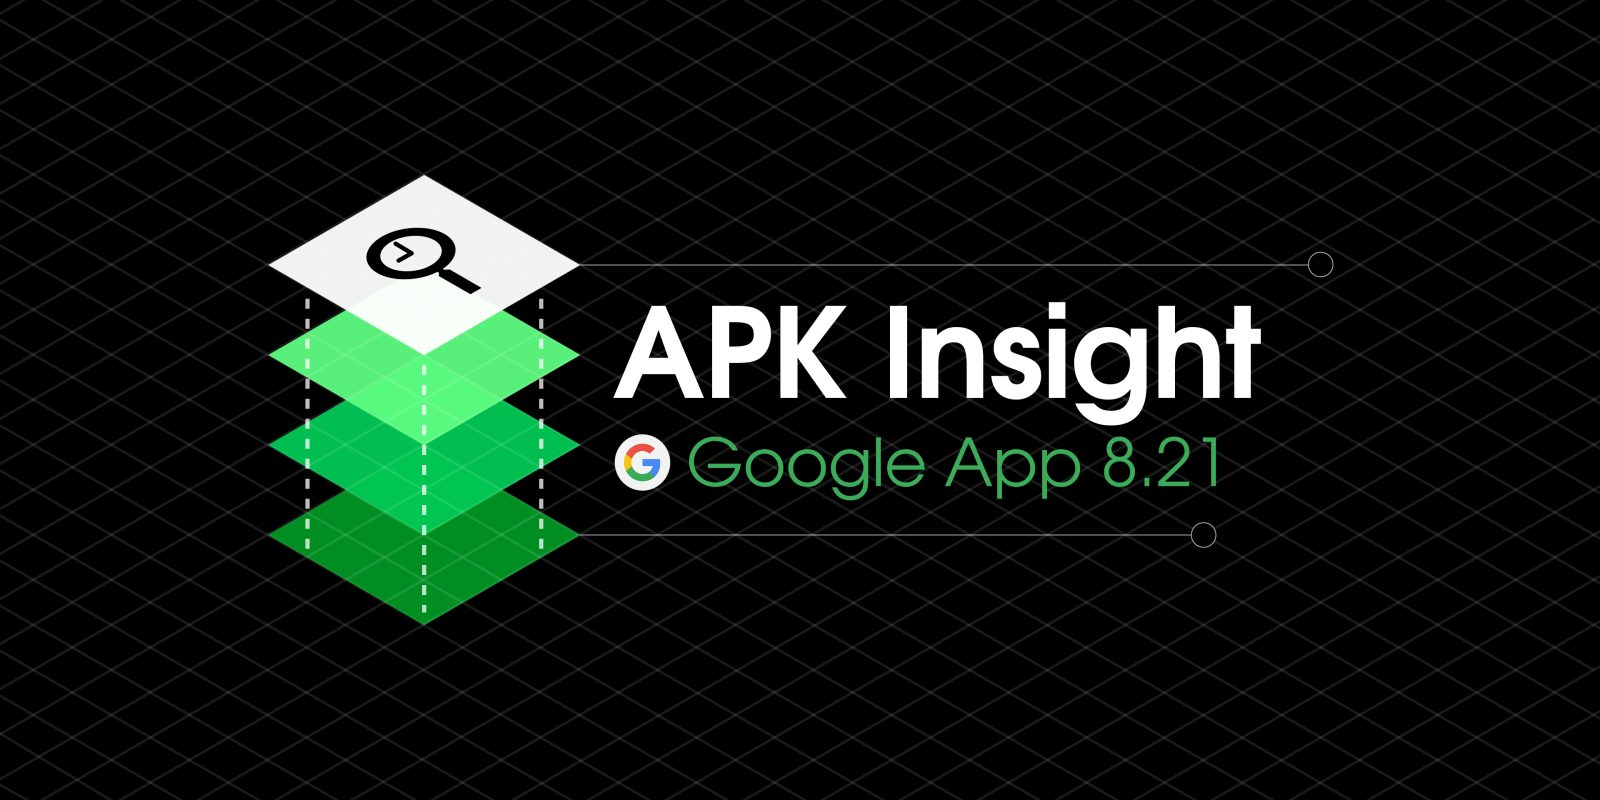 Google app 8 21 details always-on & listening Pixel Stand UI